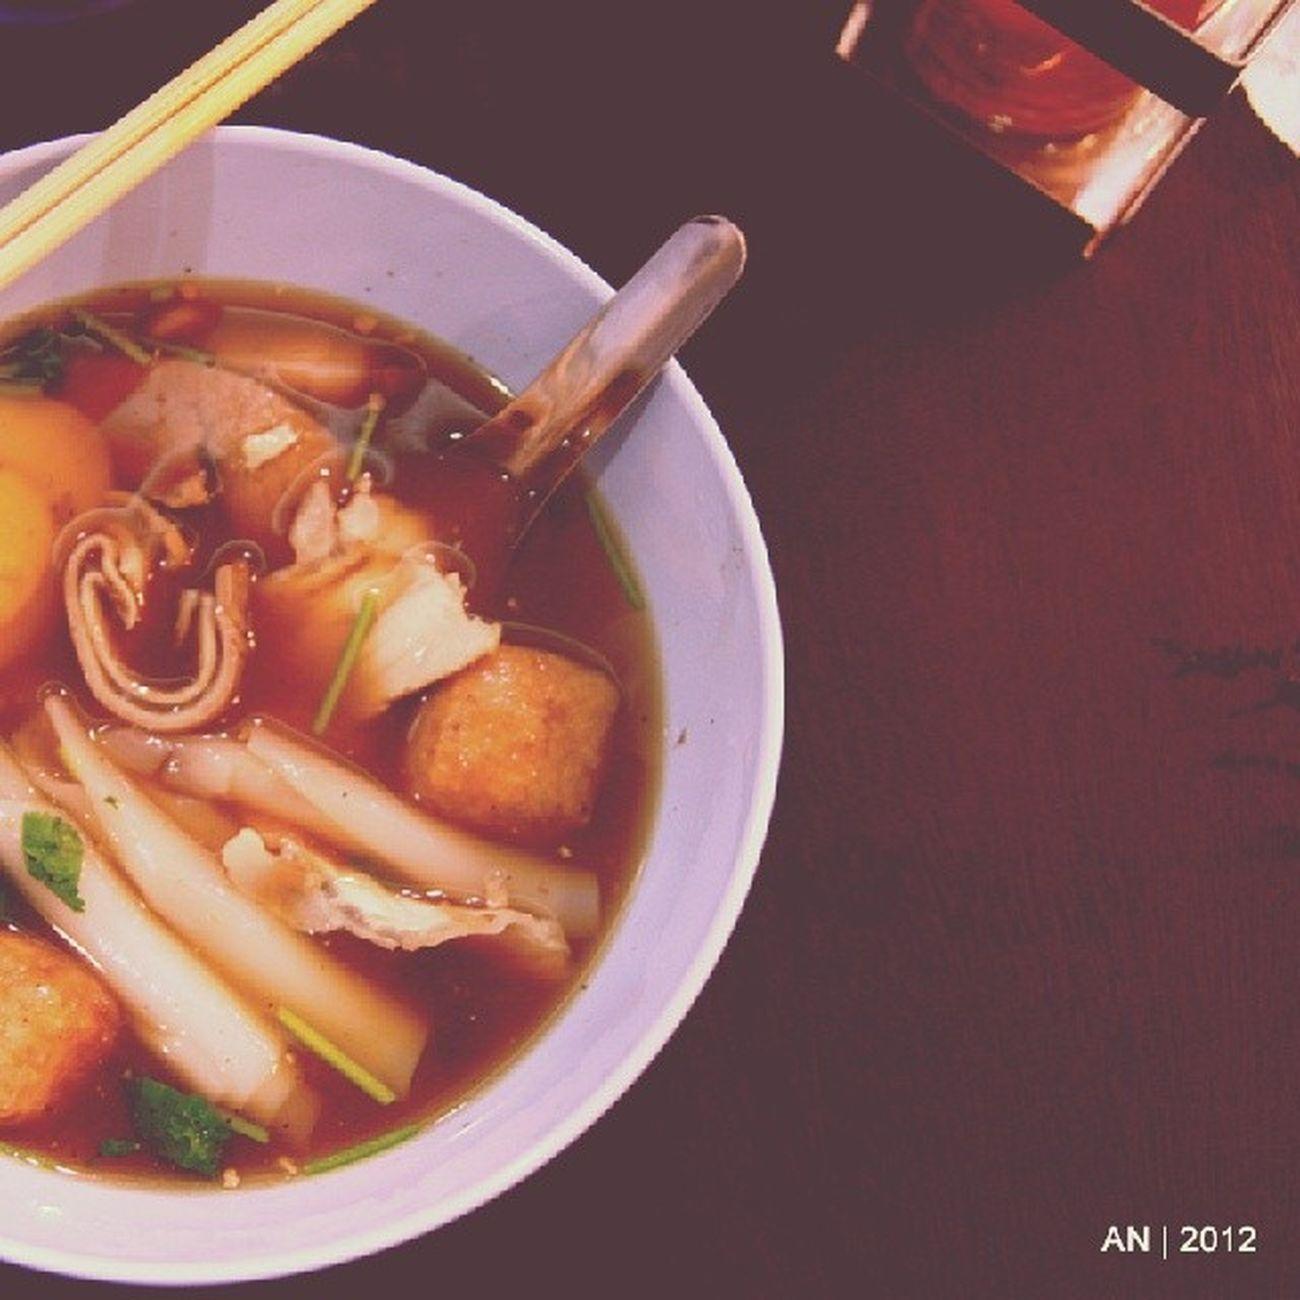 Kwaychap của @congnong đây :p Thaifood Thailand Bangkok thailandtravel yaowarat chinatown hotandspicy